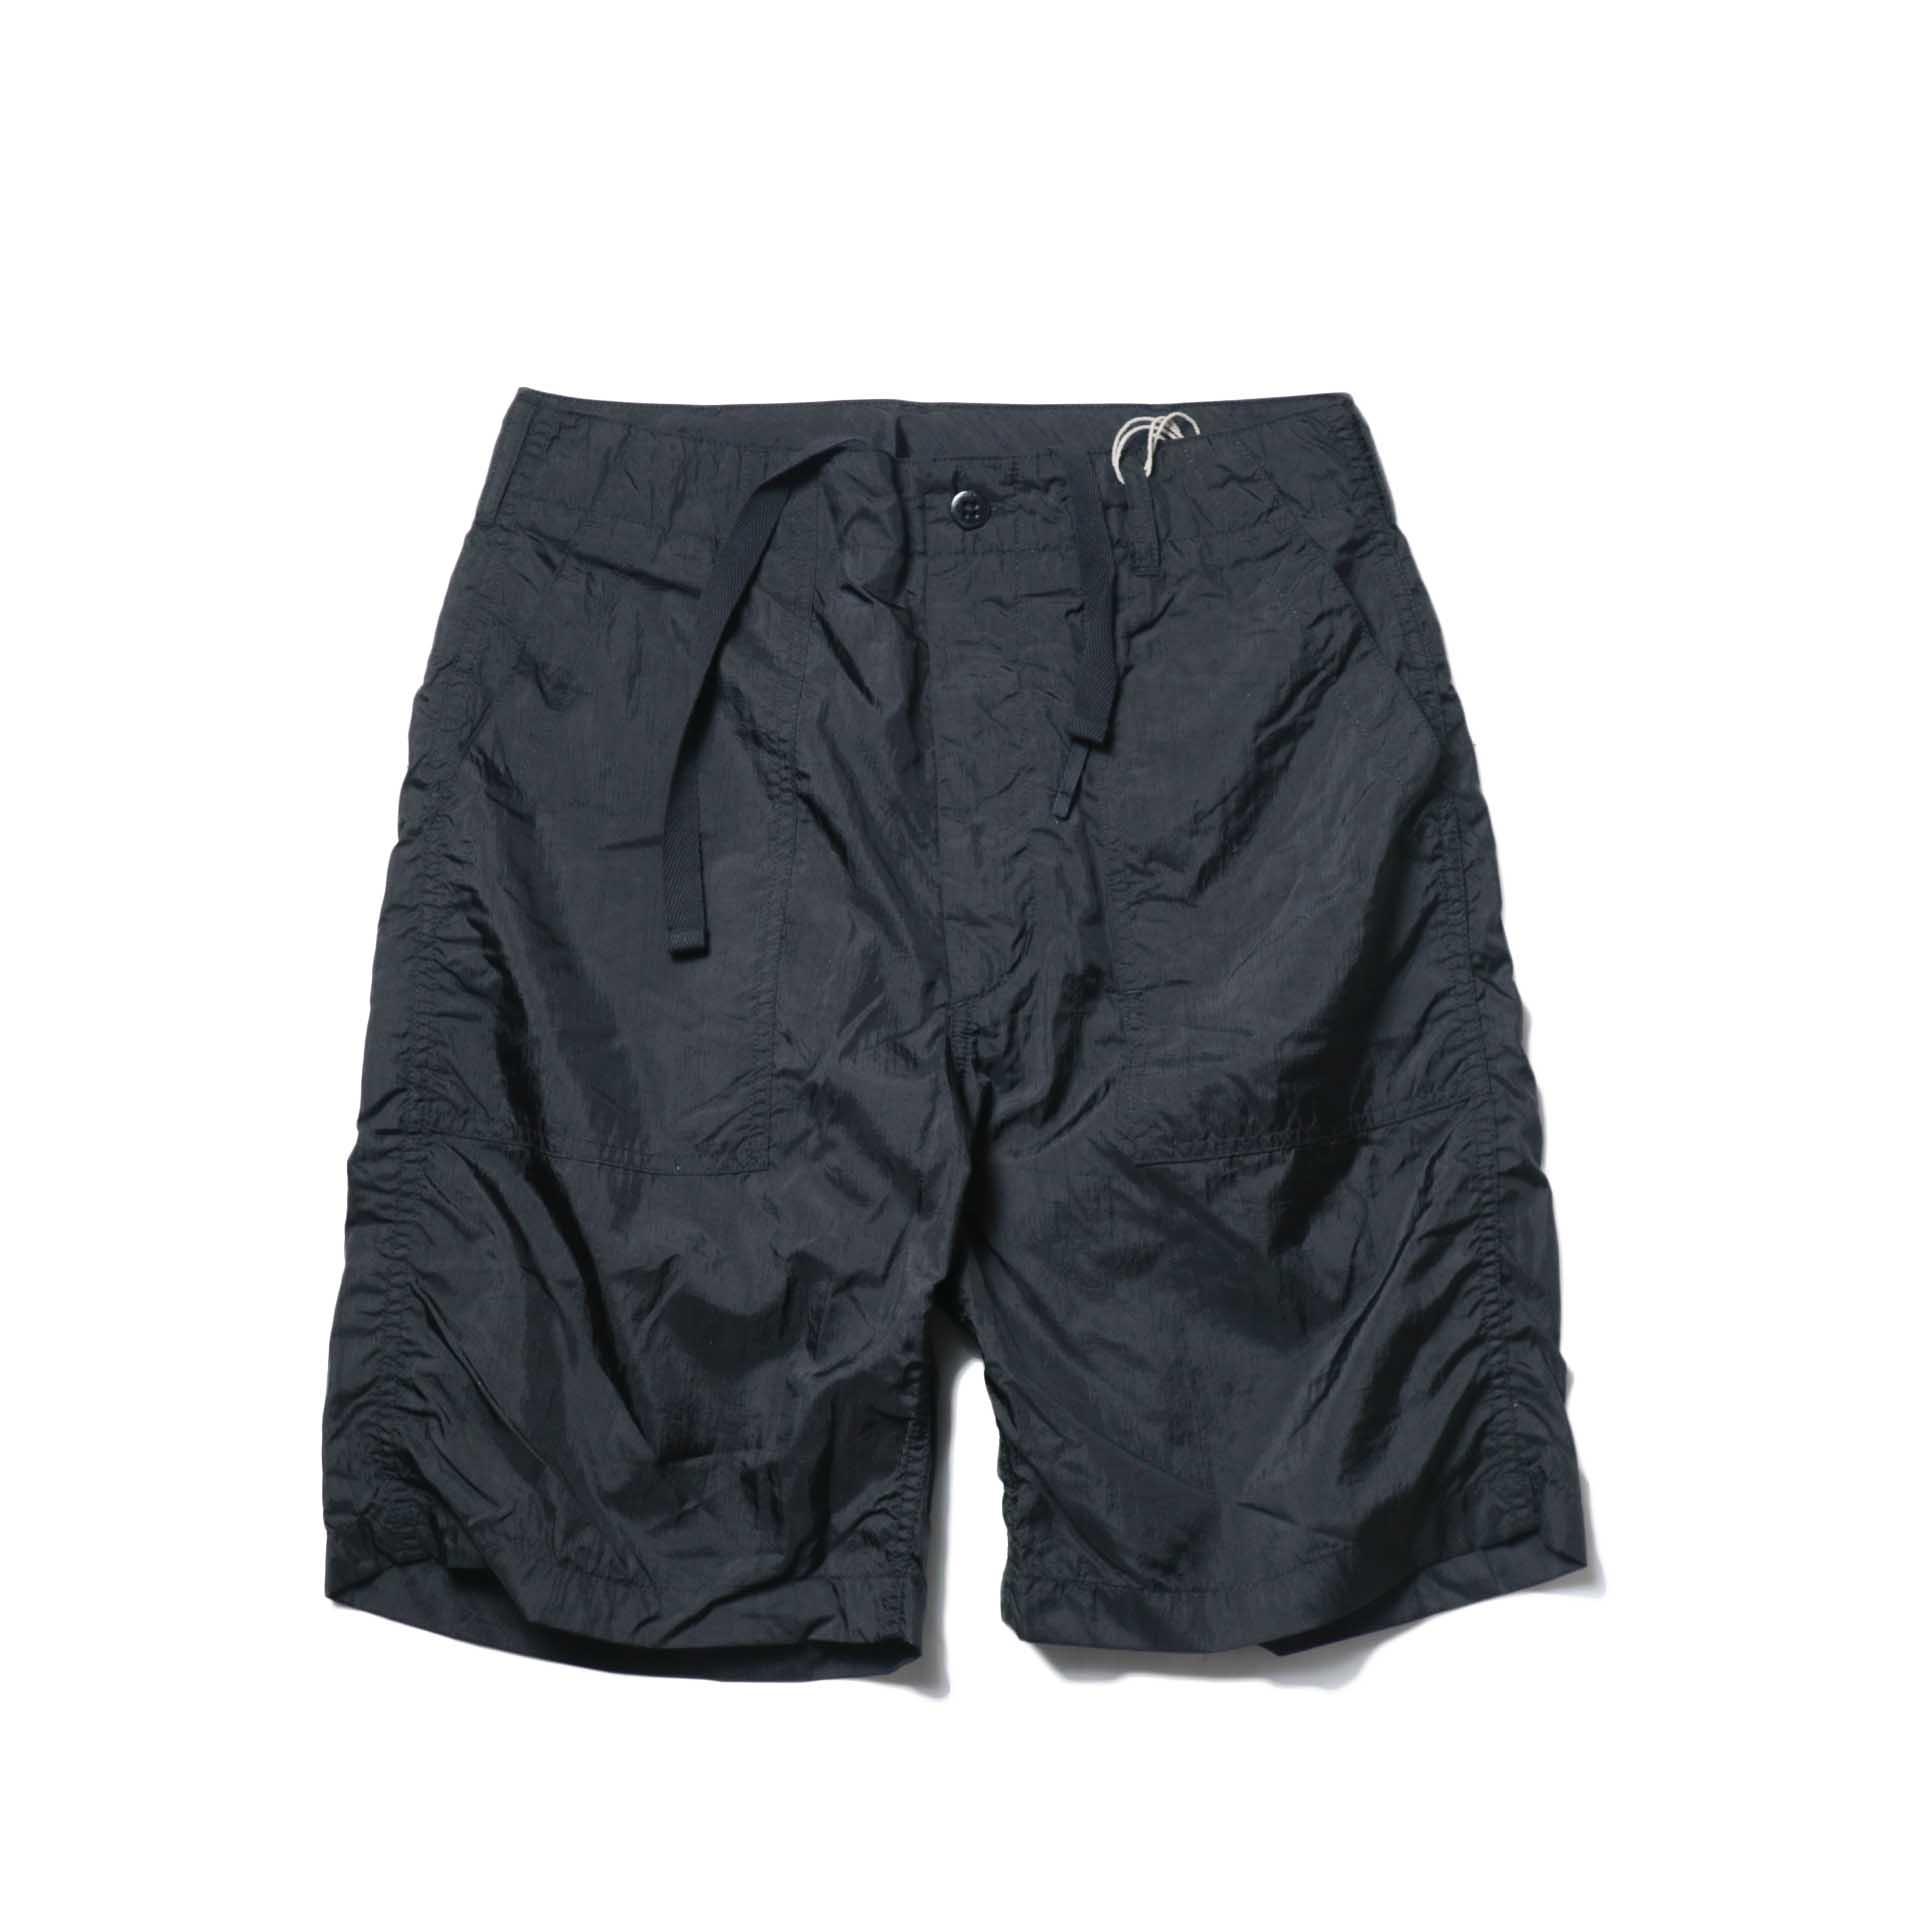 Engineered Garments / Fatigue Short -Micro Ripstop (Black)